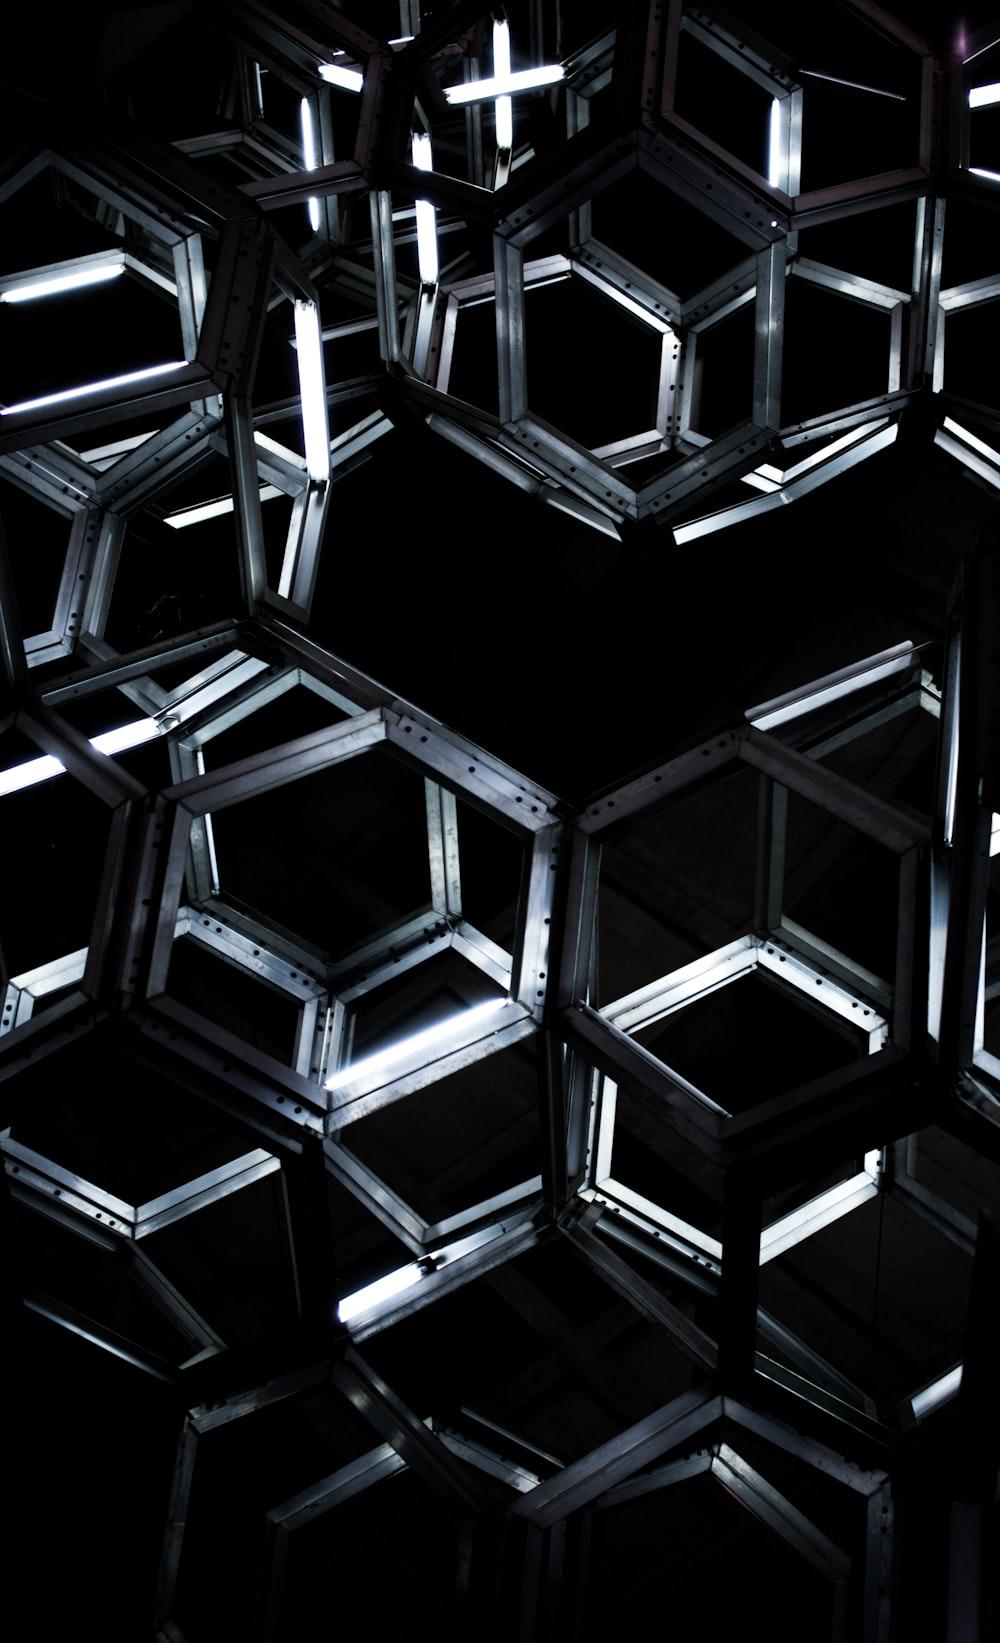 geometric black metal hanging decor